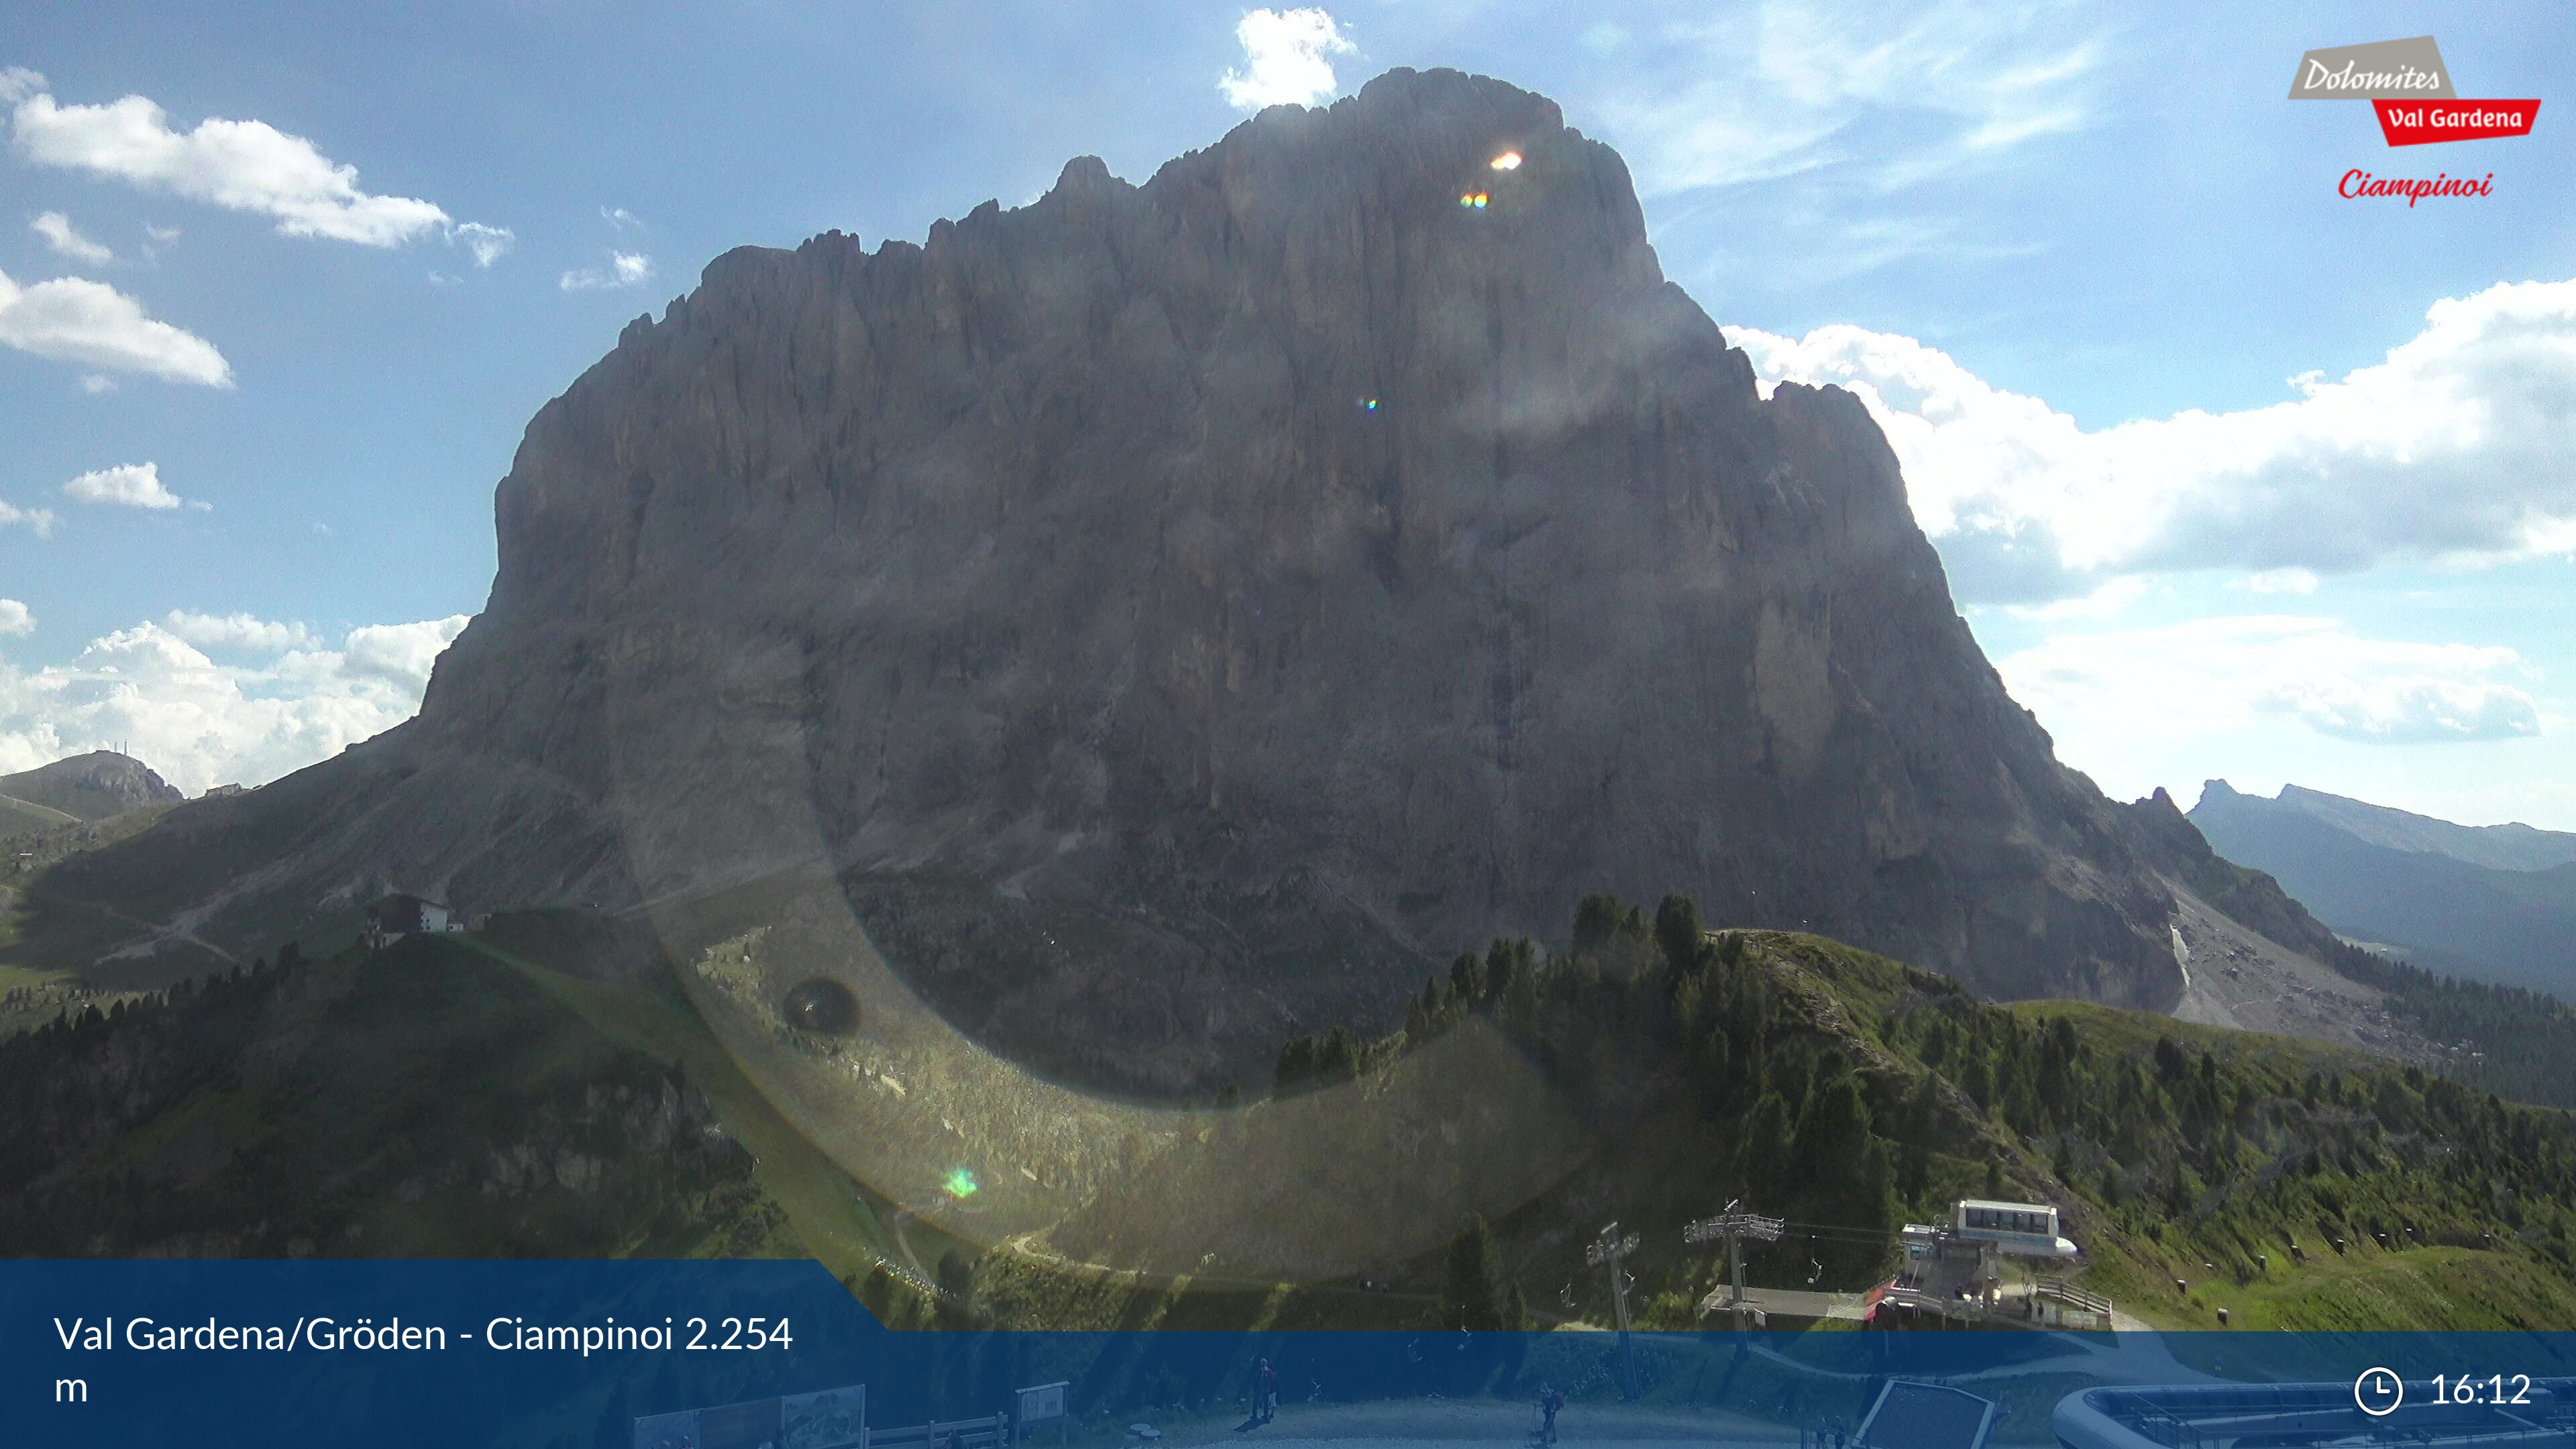 Selva Val Gardena webcam - Ciampinoi ski station 2.245